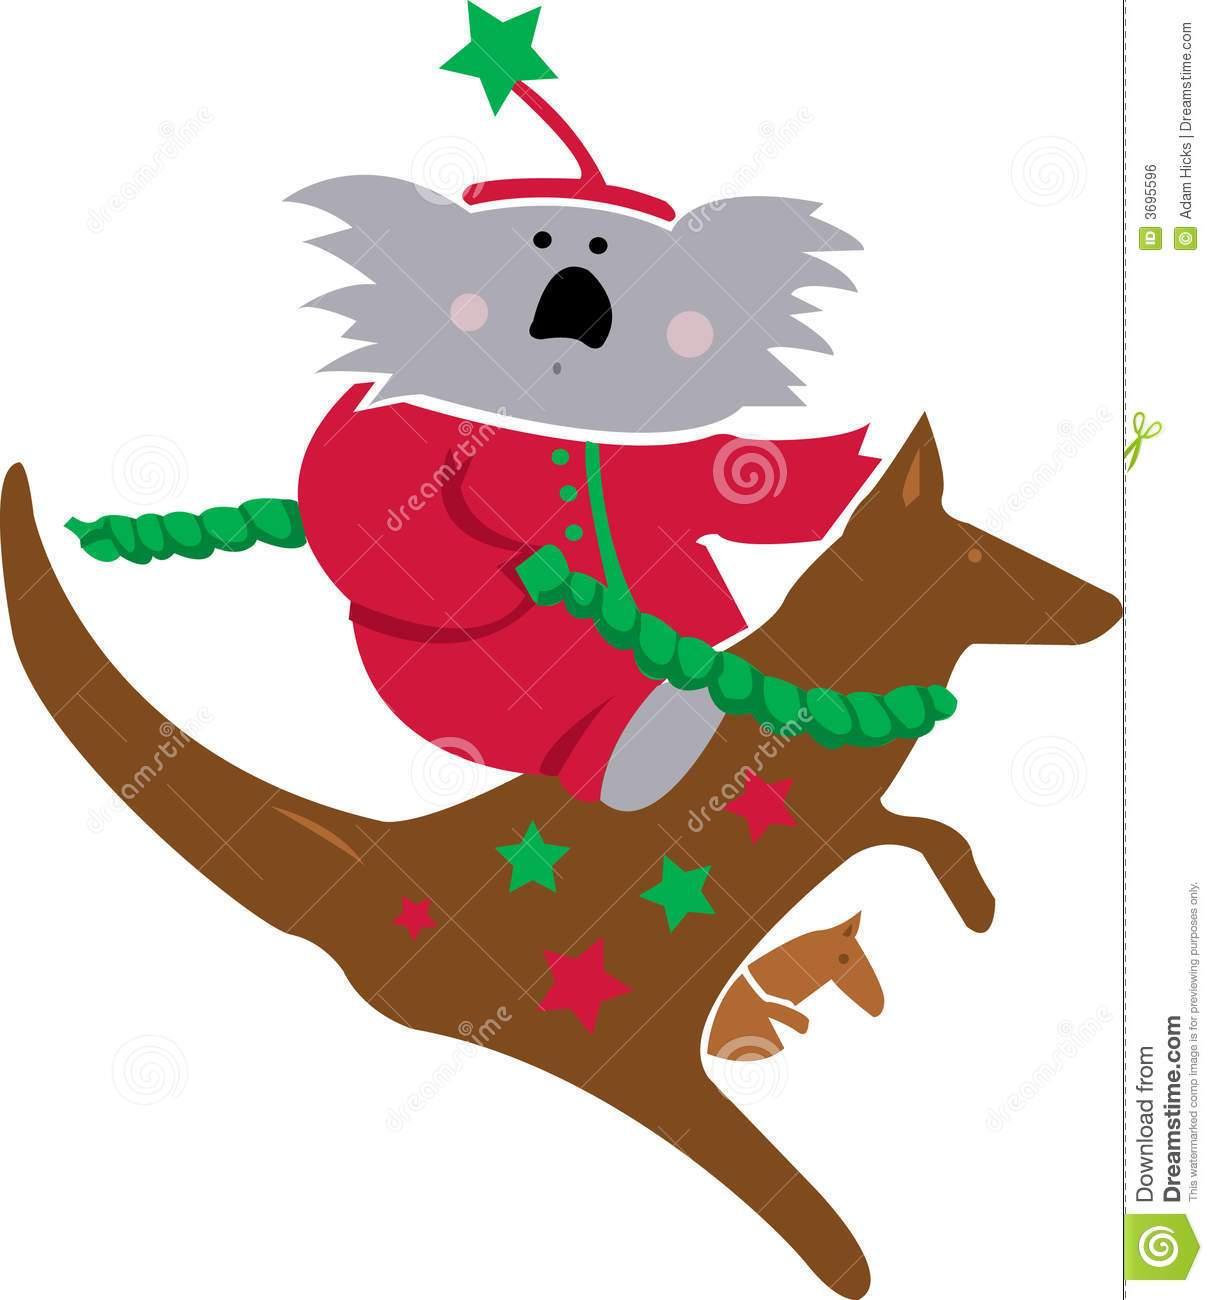 Christmas kangaroo clipart 7 » Clipart Portal.